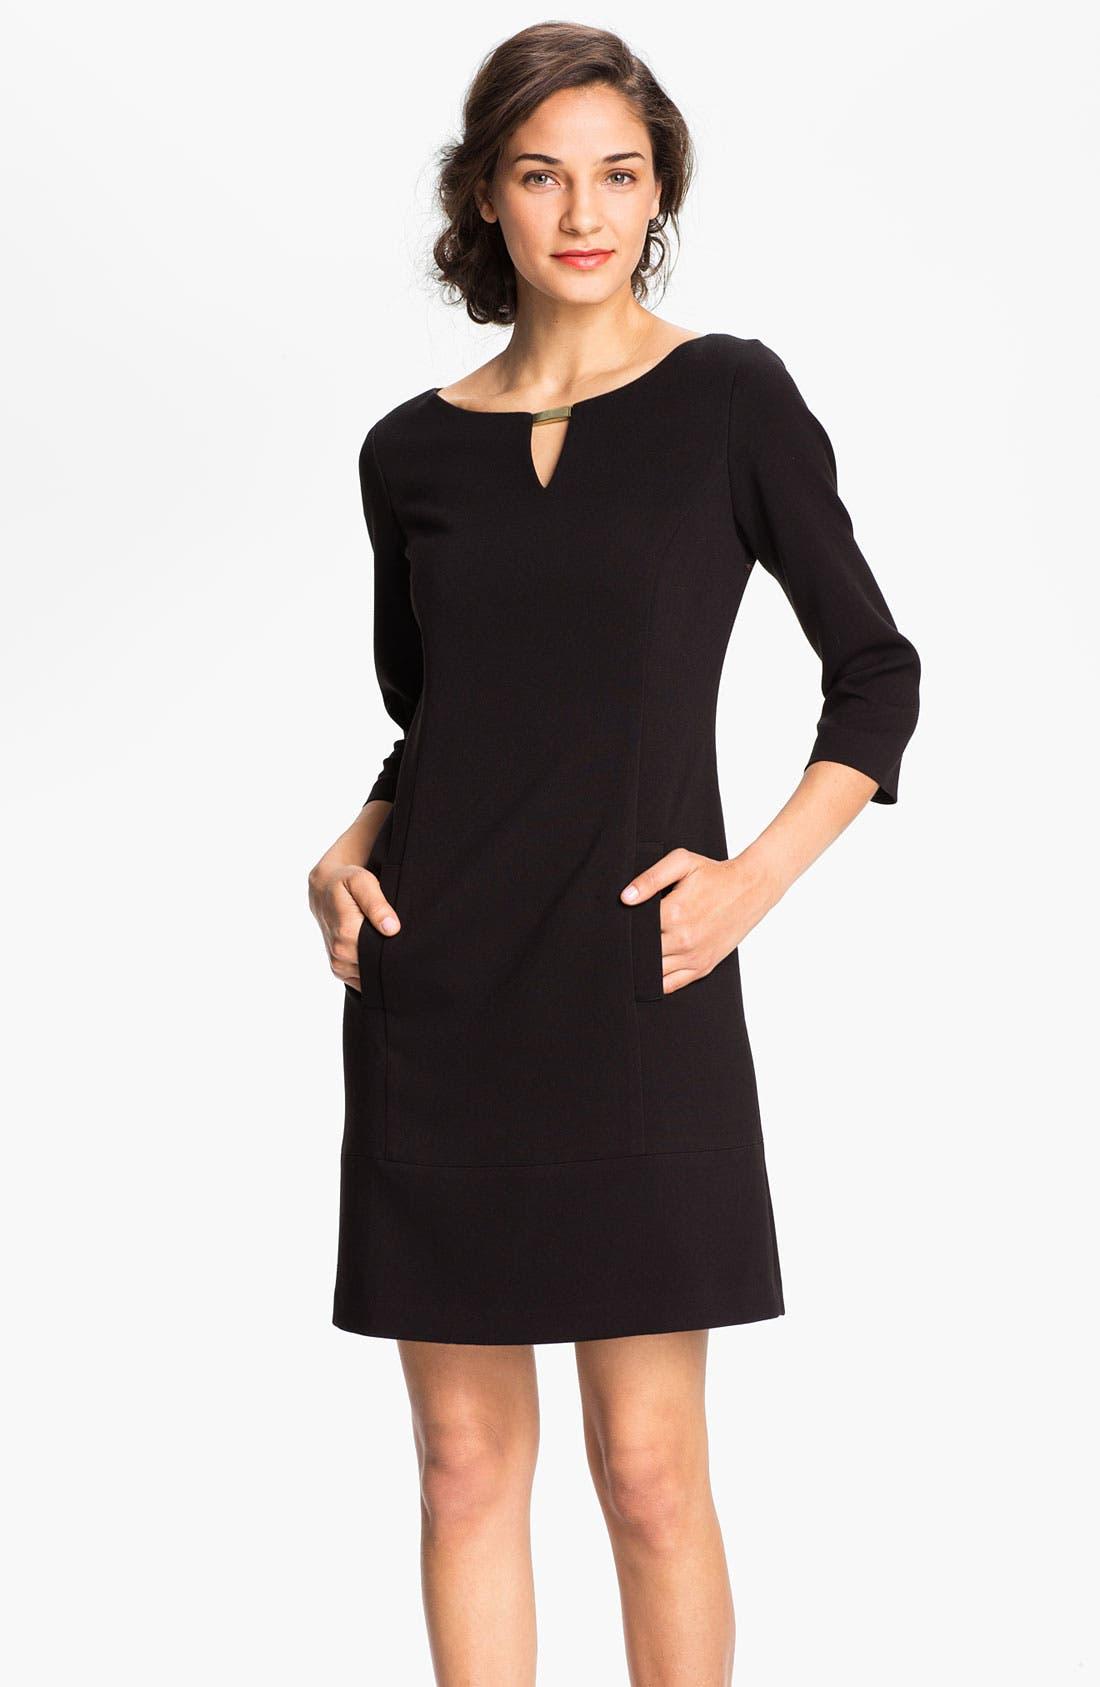 Alternate Image 1 Selected - Eliza J Keyhole Knit Shift Dress (Petite)